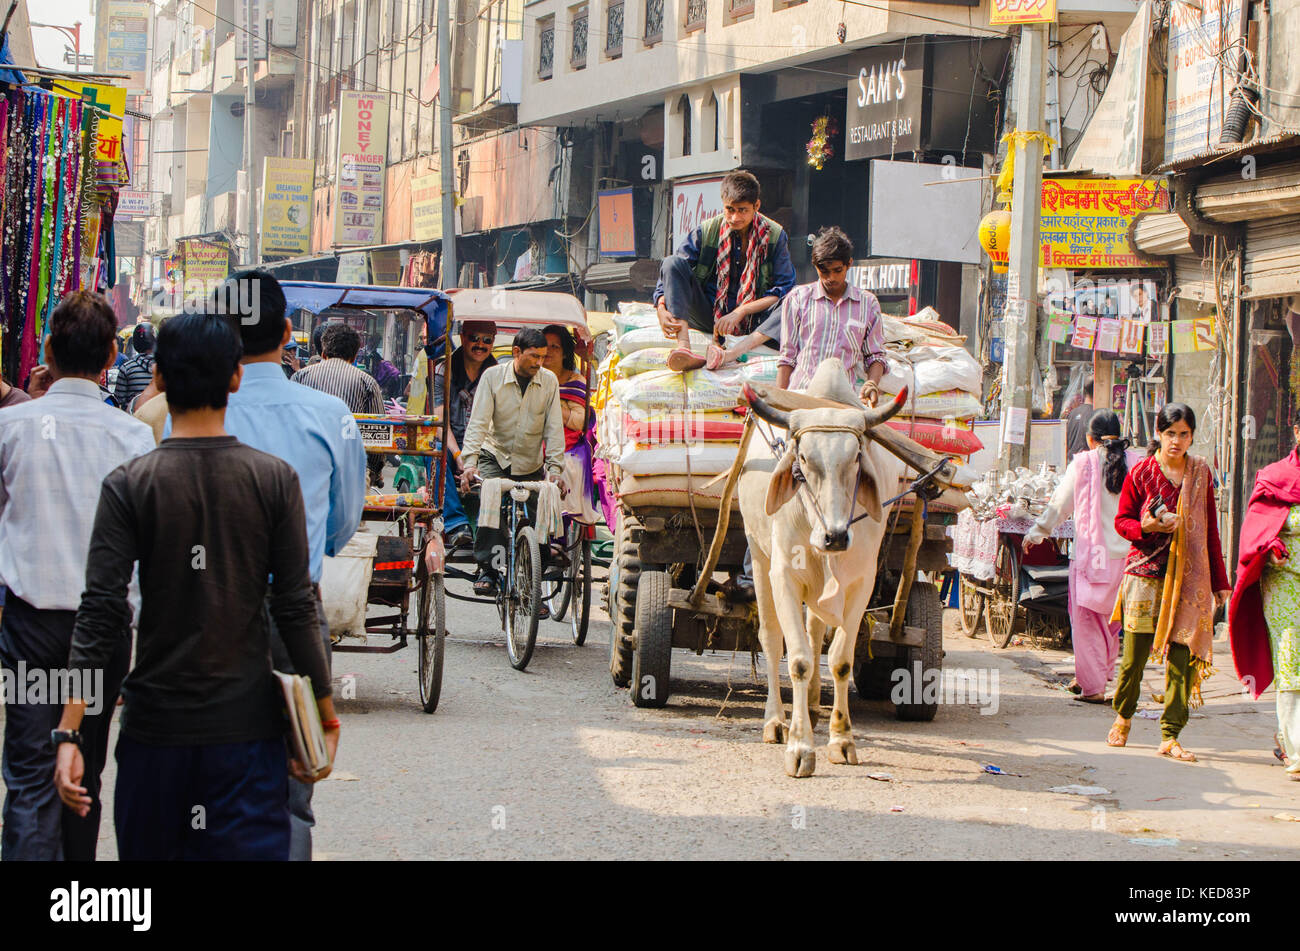 New Delhi Scenery - Stock Image